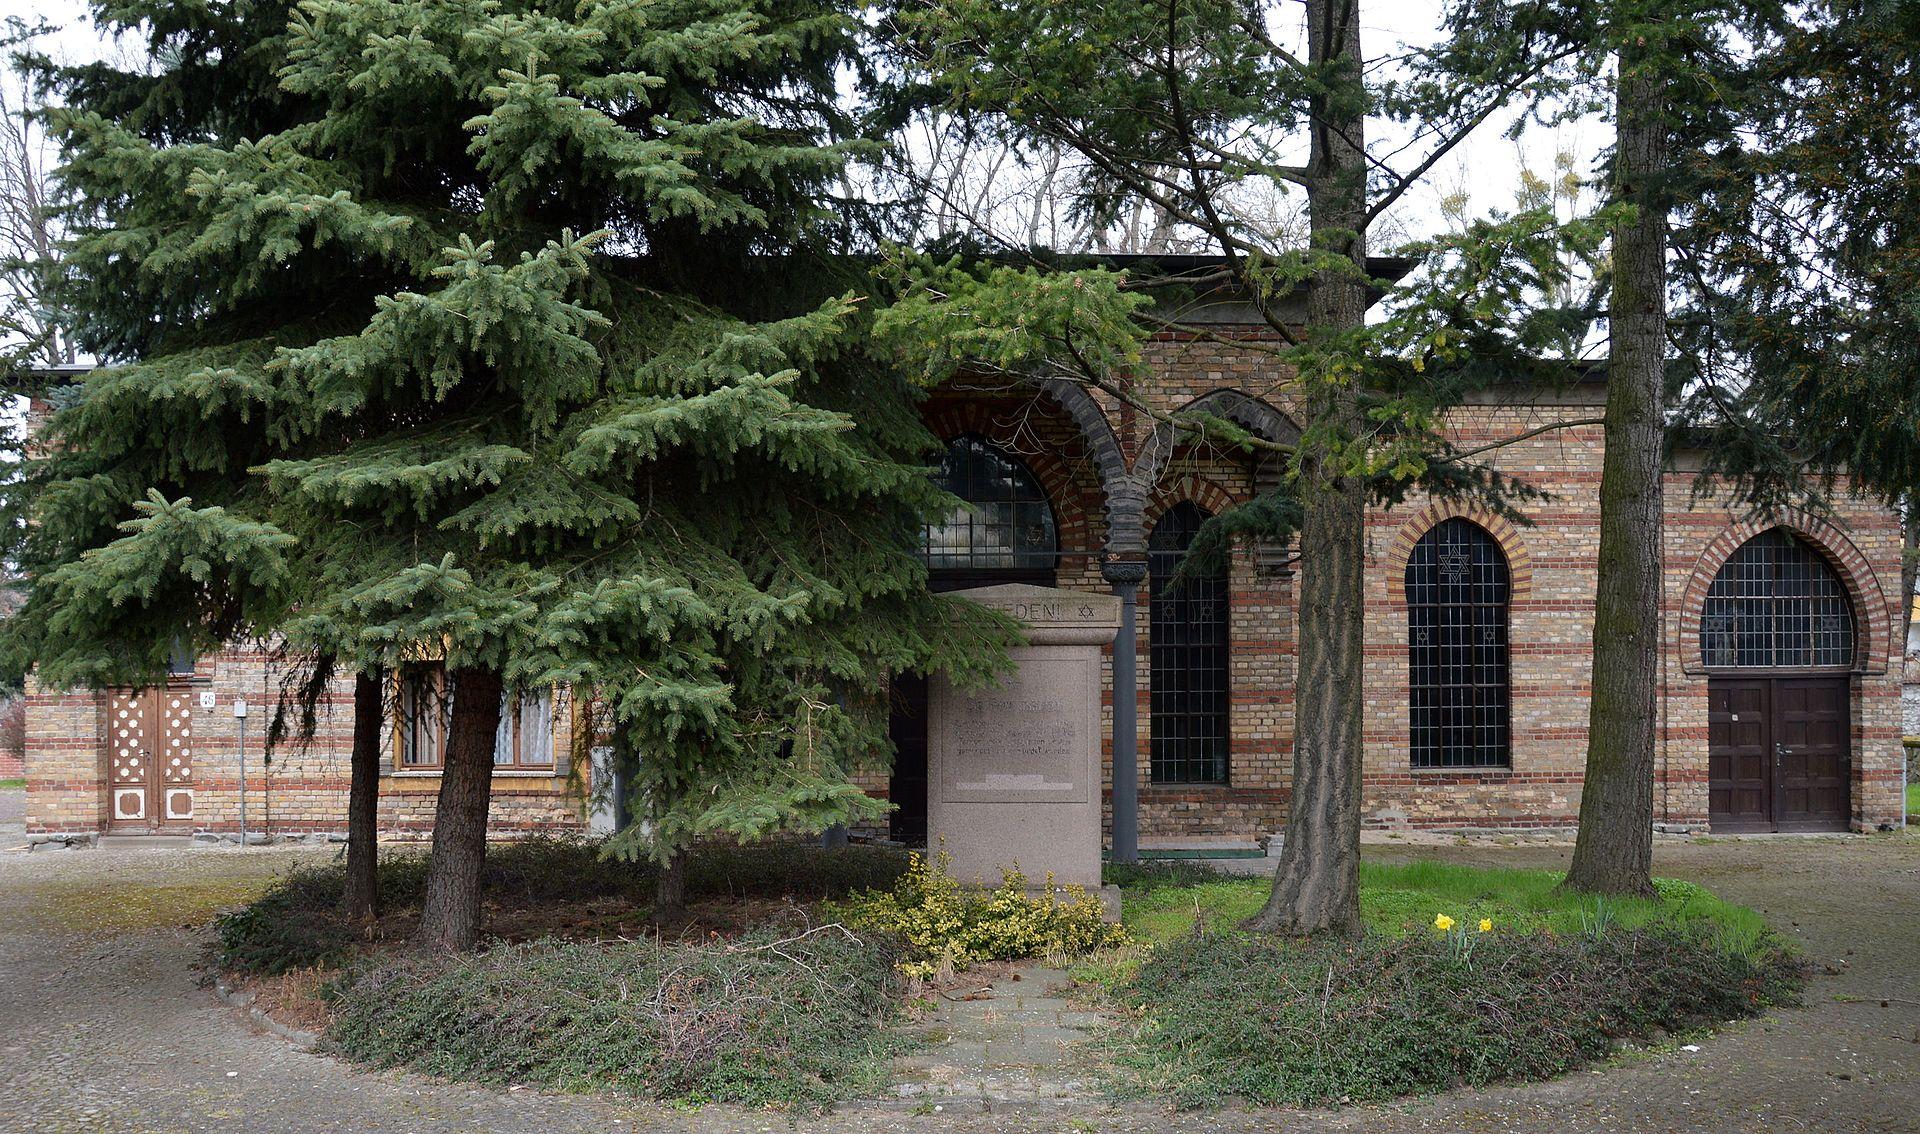 Jüdischer Friedhof Magdeburg Blick auf den Friedhof.jpg